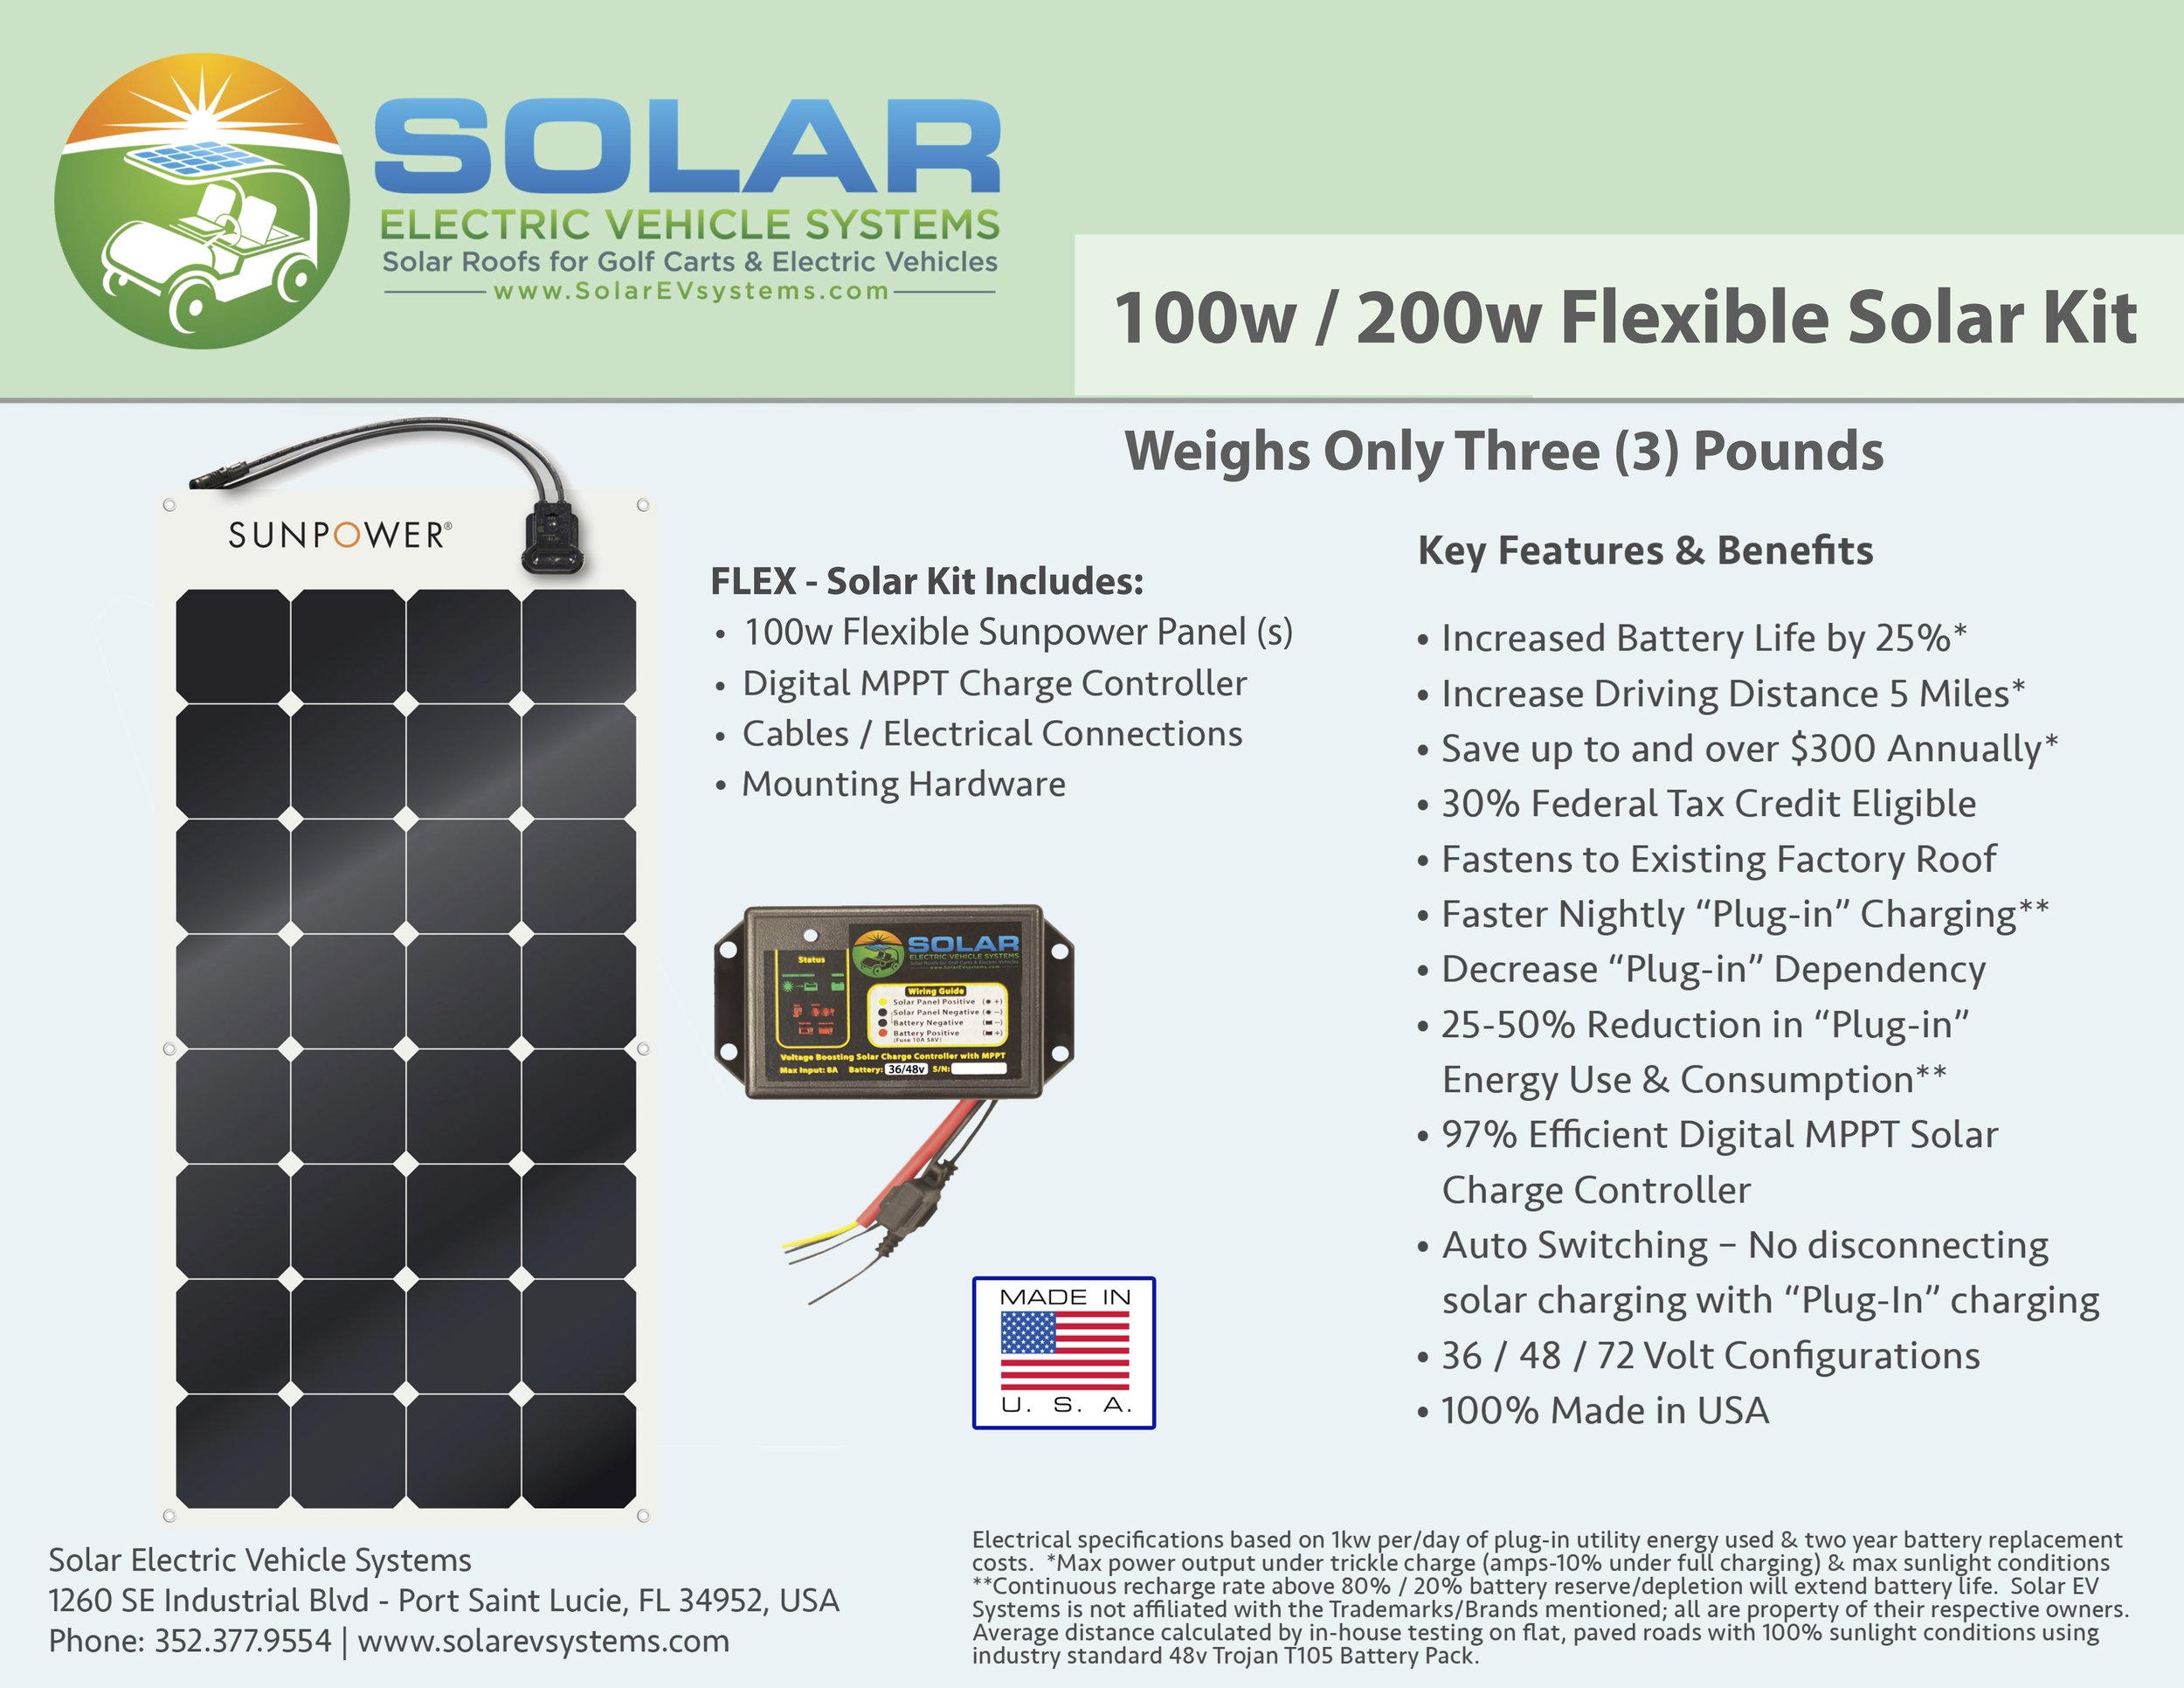 100 Watt Flexable Solar Panel Kit — Solar EV Systems - Solar Golf Carts,  Roof, Tops, Solar Panel LSV Cart Kit for EZGO, Club Car, STAR, Yamaha, Bad